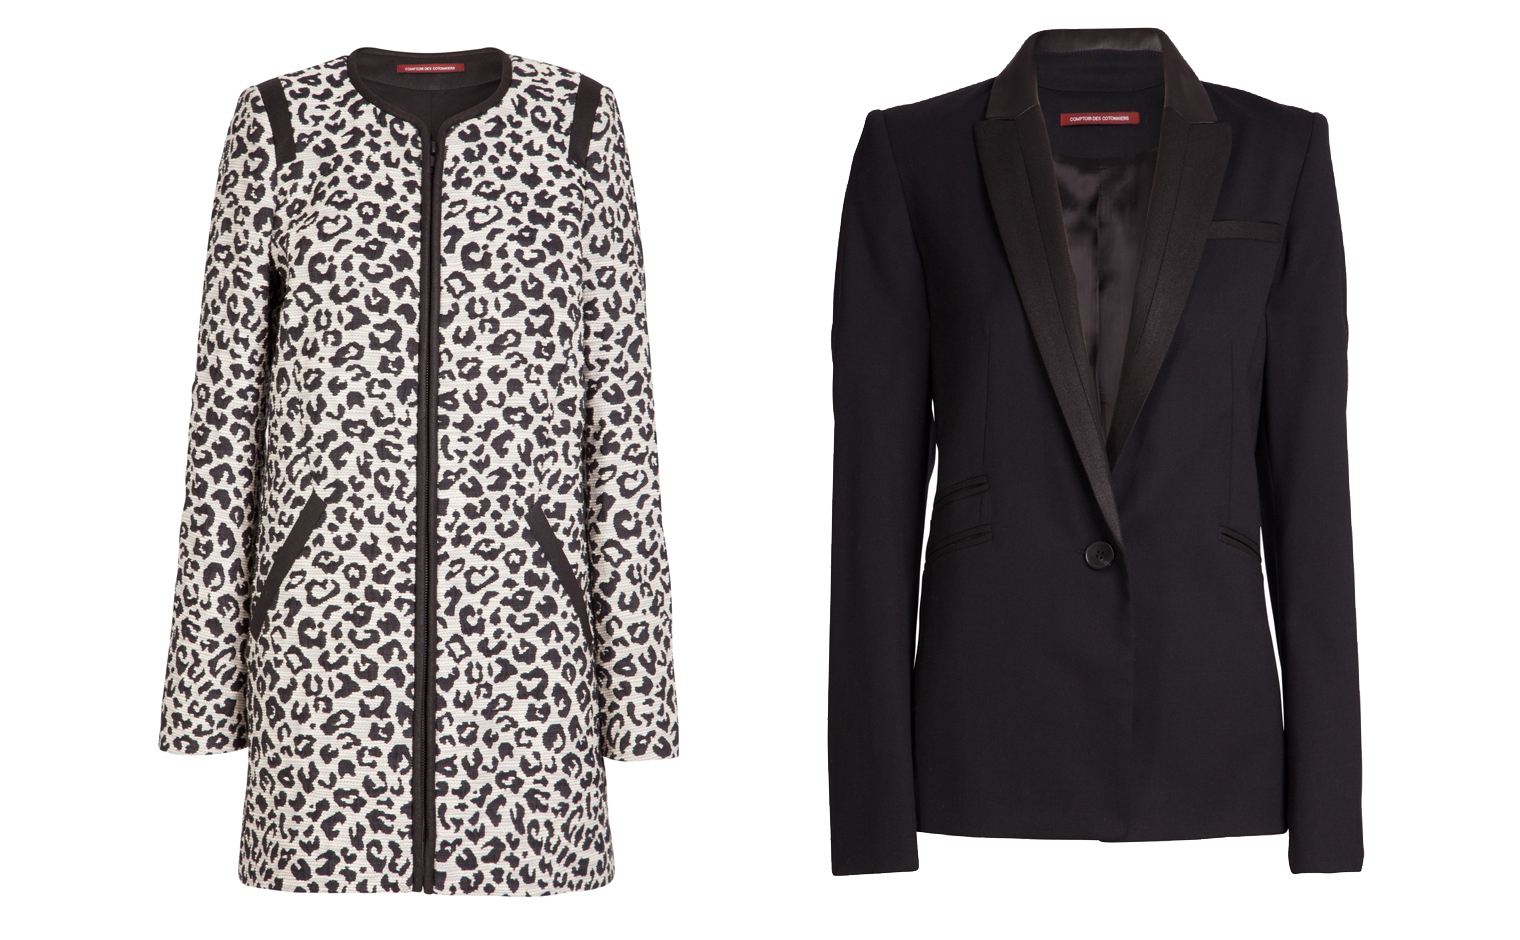 trendy_taste-look-outfit-blog-blogger-fashion_spain-moda_españa-giveaway-sorteo-comptoir_des_cotonniers-collage-2